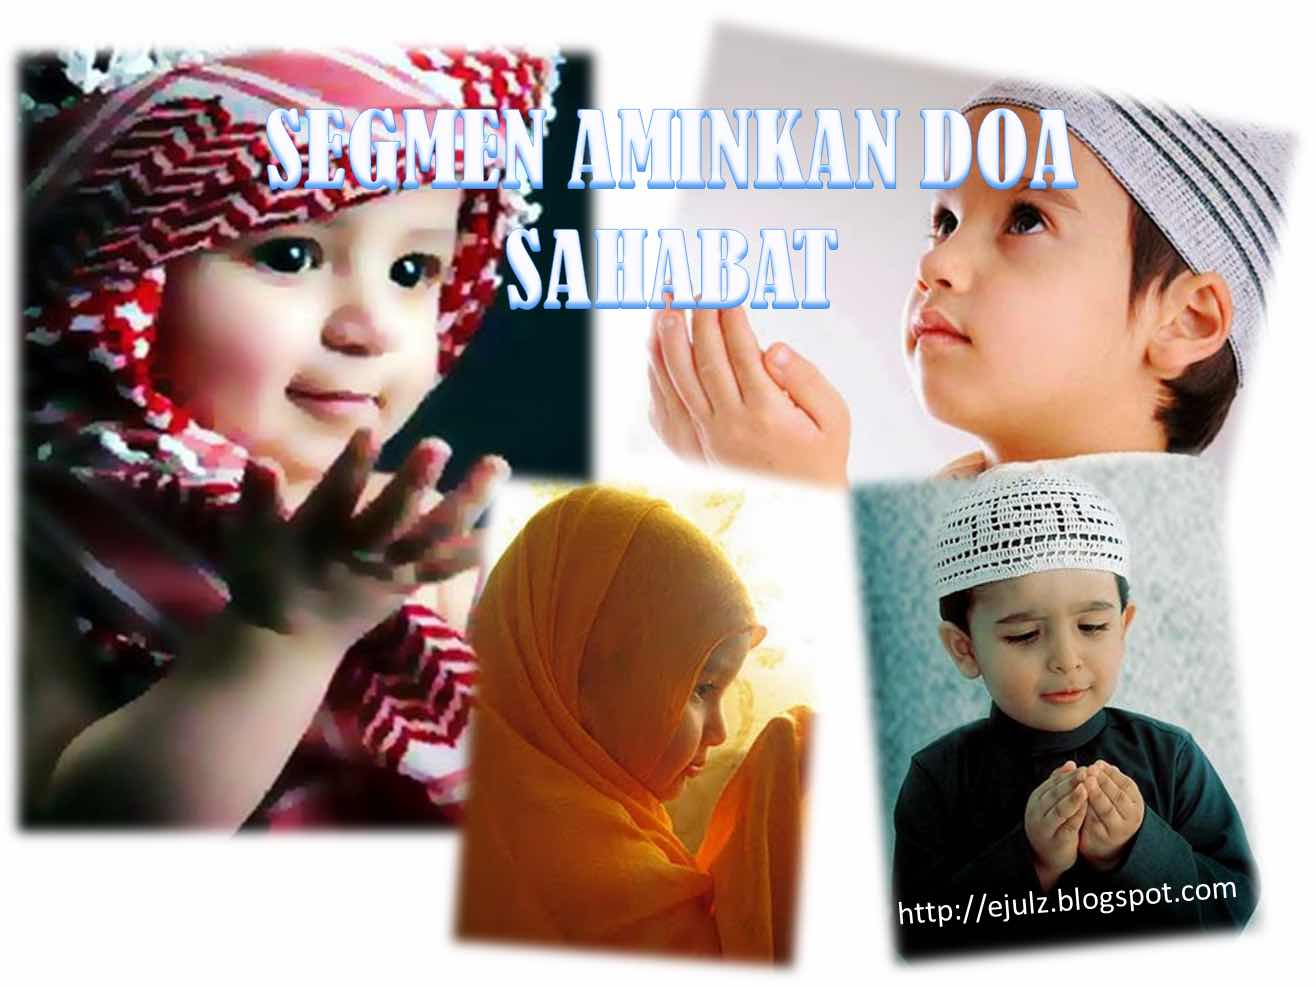 https://ejulz.blogspot.my/2018/04/segmen-aminkan-doa-sahabat.html?m=0